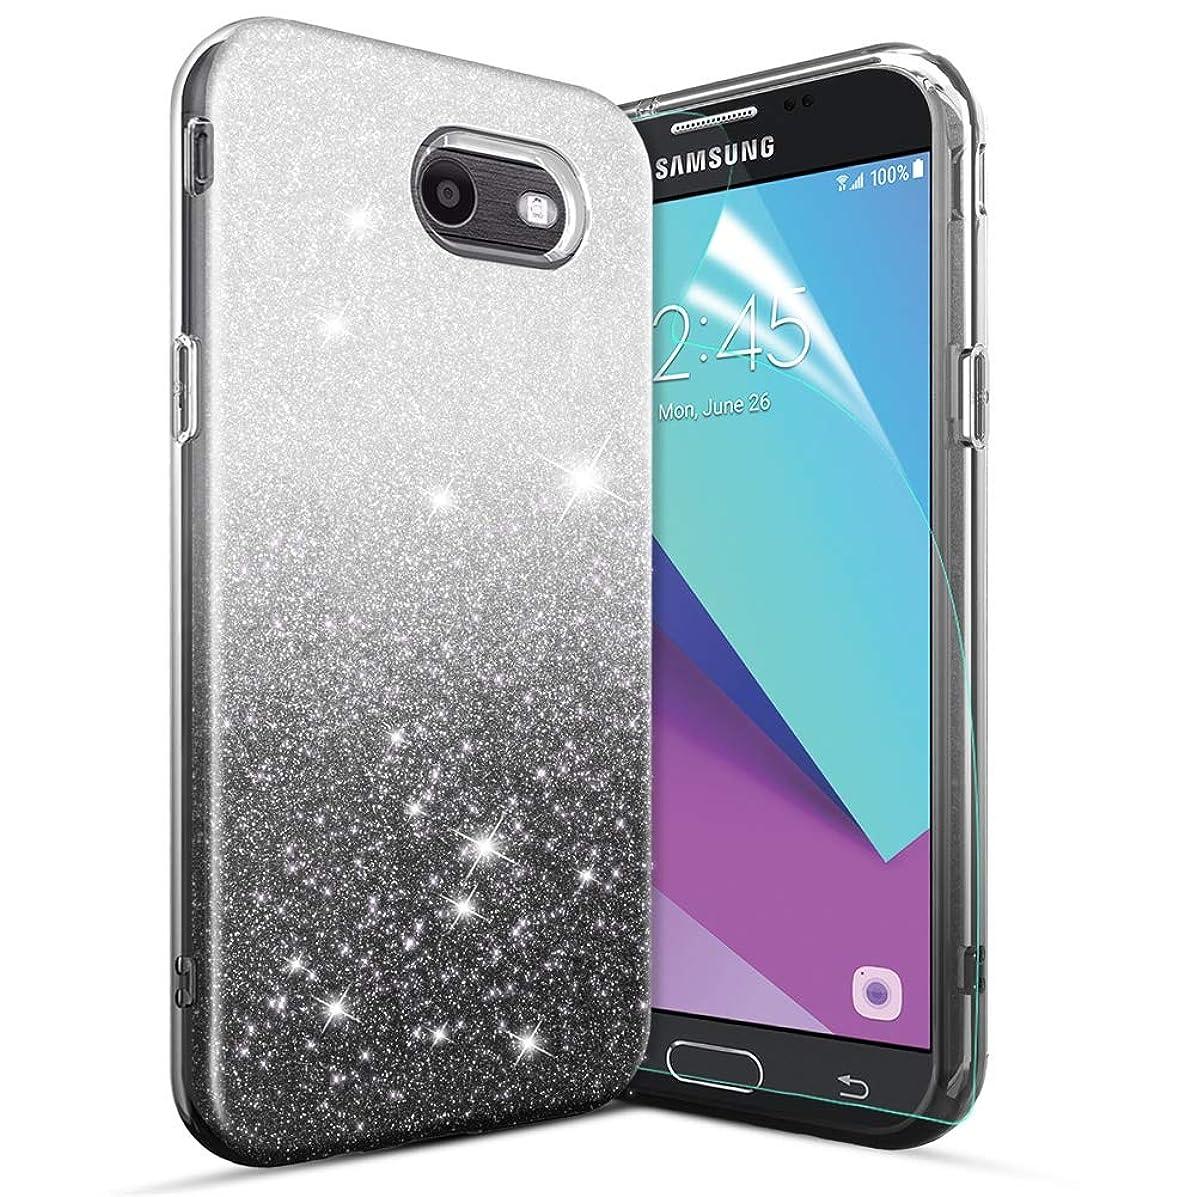 Glitter Case for Galaxy J7 2017/Galaxy J7 Prime/Galaxy J7 Sky Pro/J7 V J7V 2017/Halo/Galaxy J7 Perx Case[Super Sparkly][Slim 3 Layers Hybrid][Anti-Scratch] Bling Phone Case for Girls/Women-Black